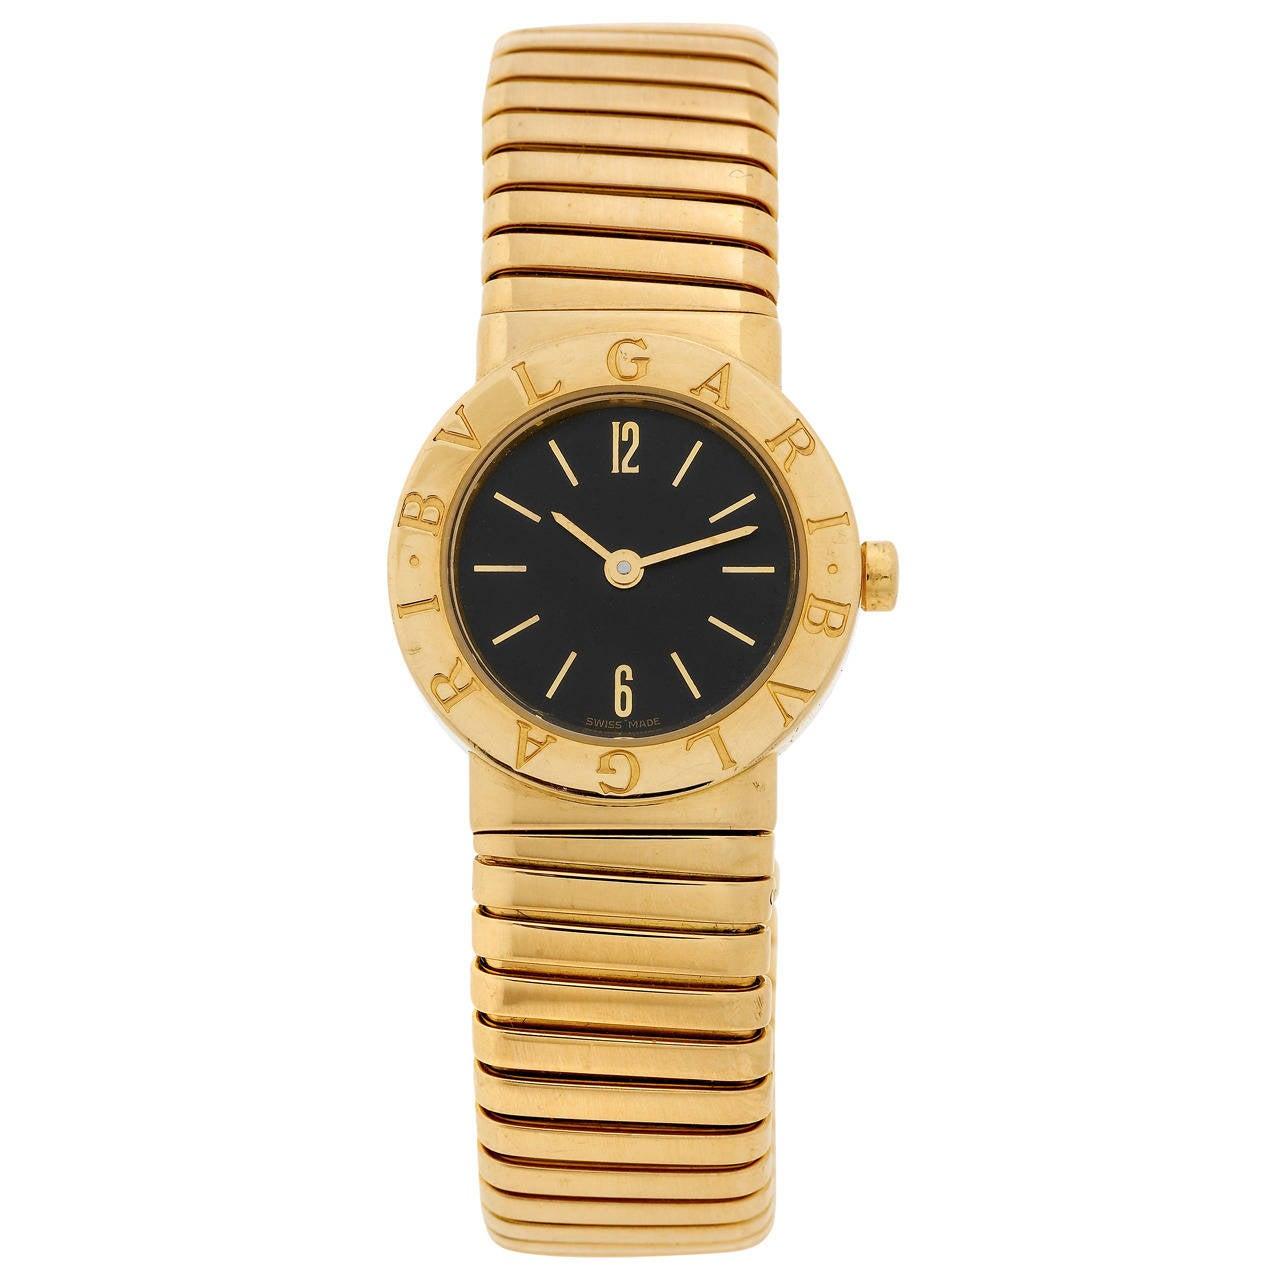 Bulgari Lady's Gold Tubogas Quartz Wristwatch 1